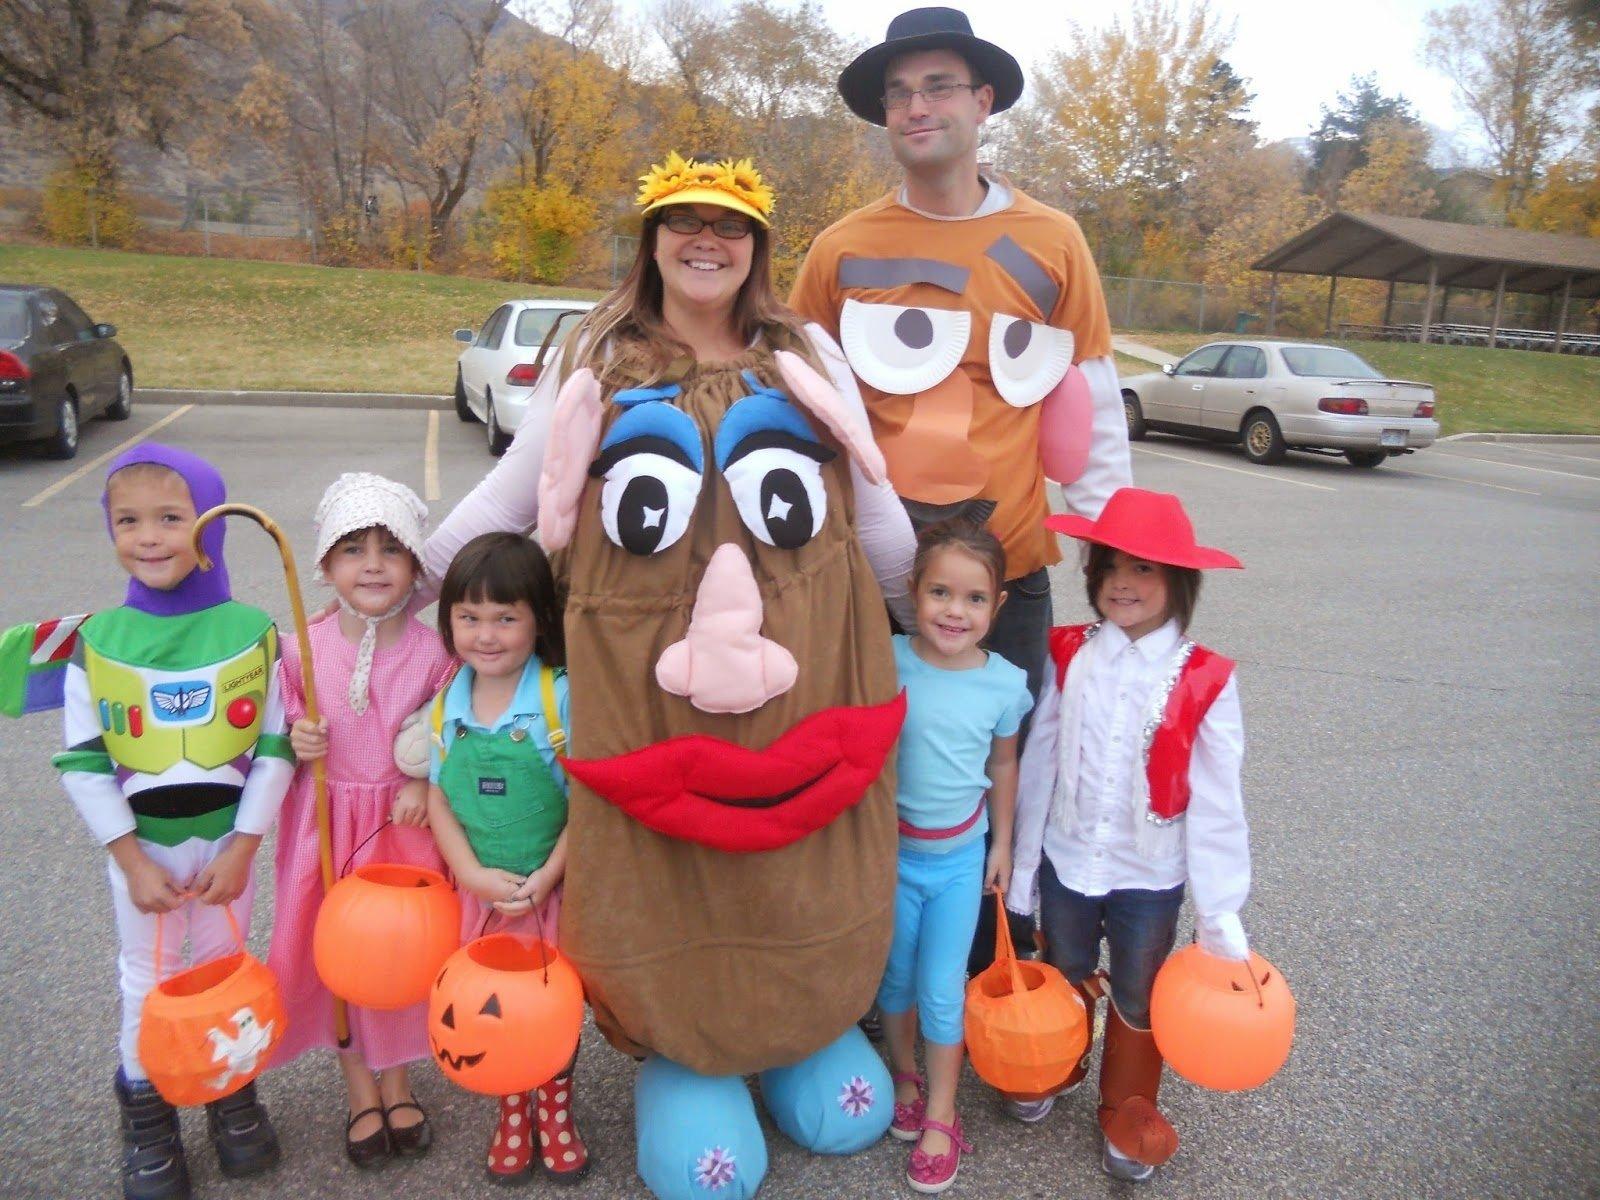 10 Lovable Best Homemade Halloween Costume Ideas the best homemade halloween costume ideas rad mom cool kid 2020